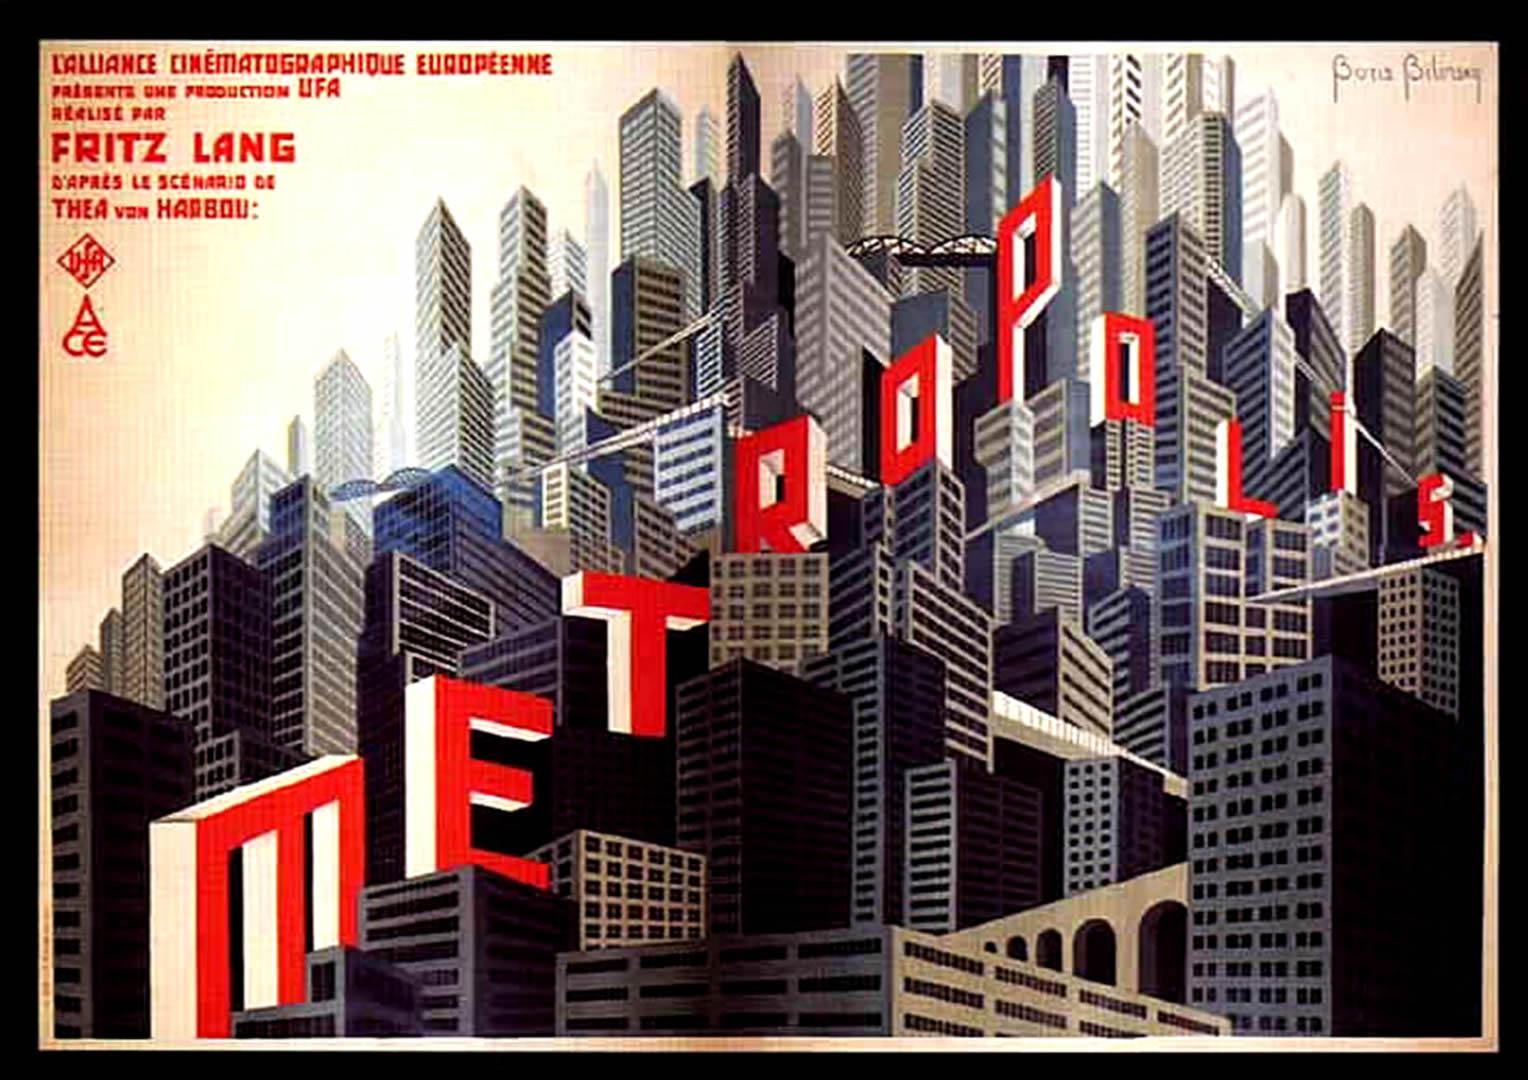 Retro Sci Fi Wallpaper WallpaperSafari Movie Film Book Cinema 1528x1080